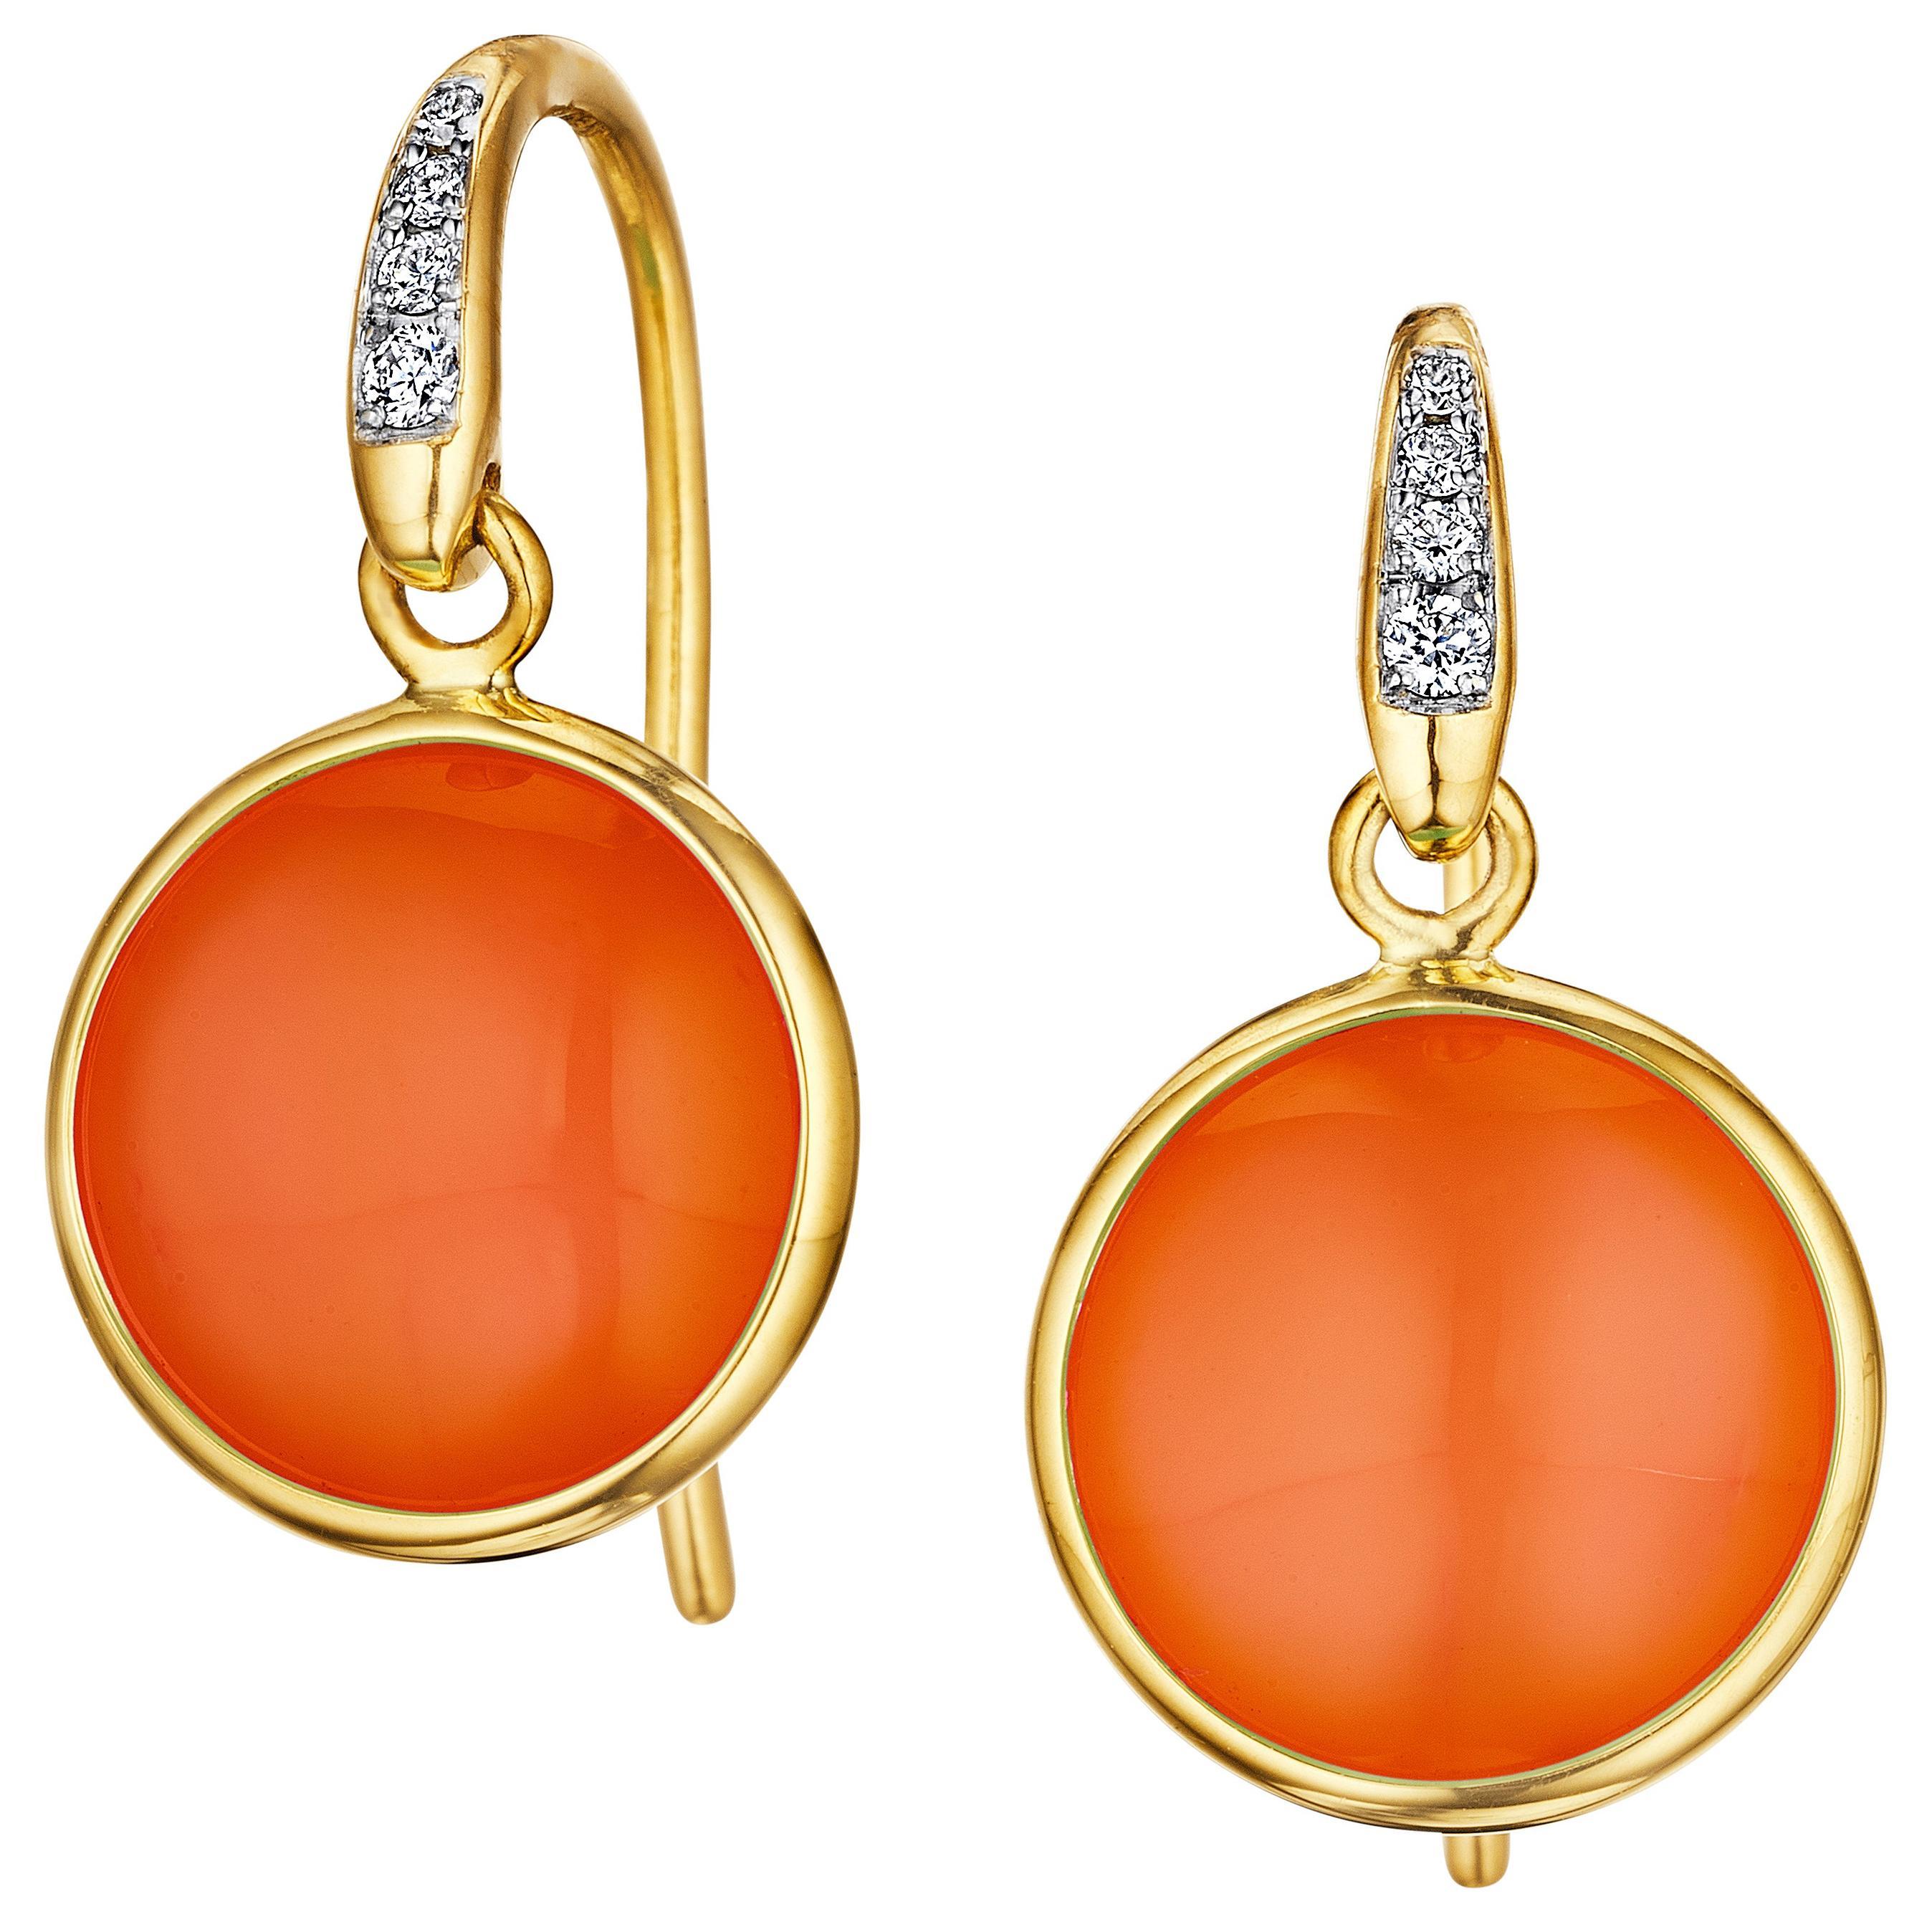 Syna Orange Chalcedony Yellow Gold Earrings with Diamonds